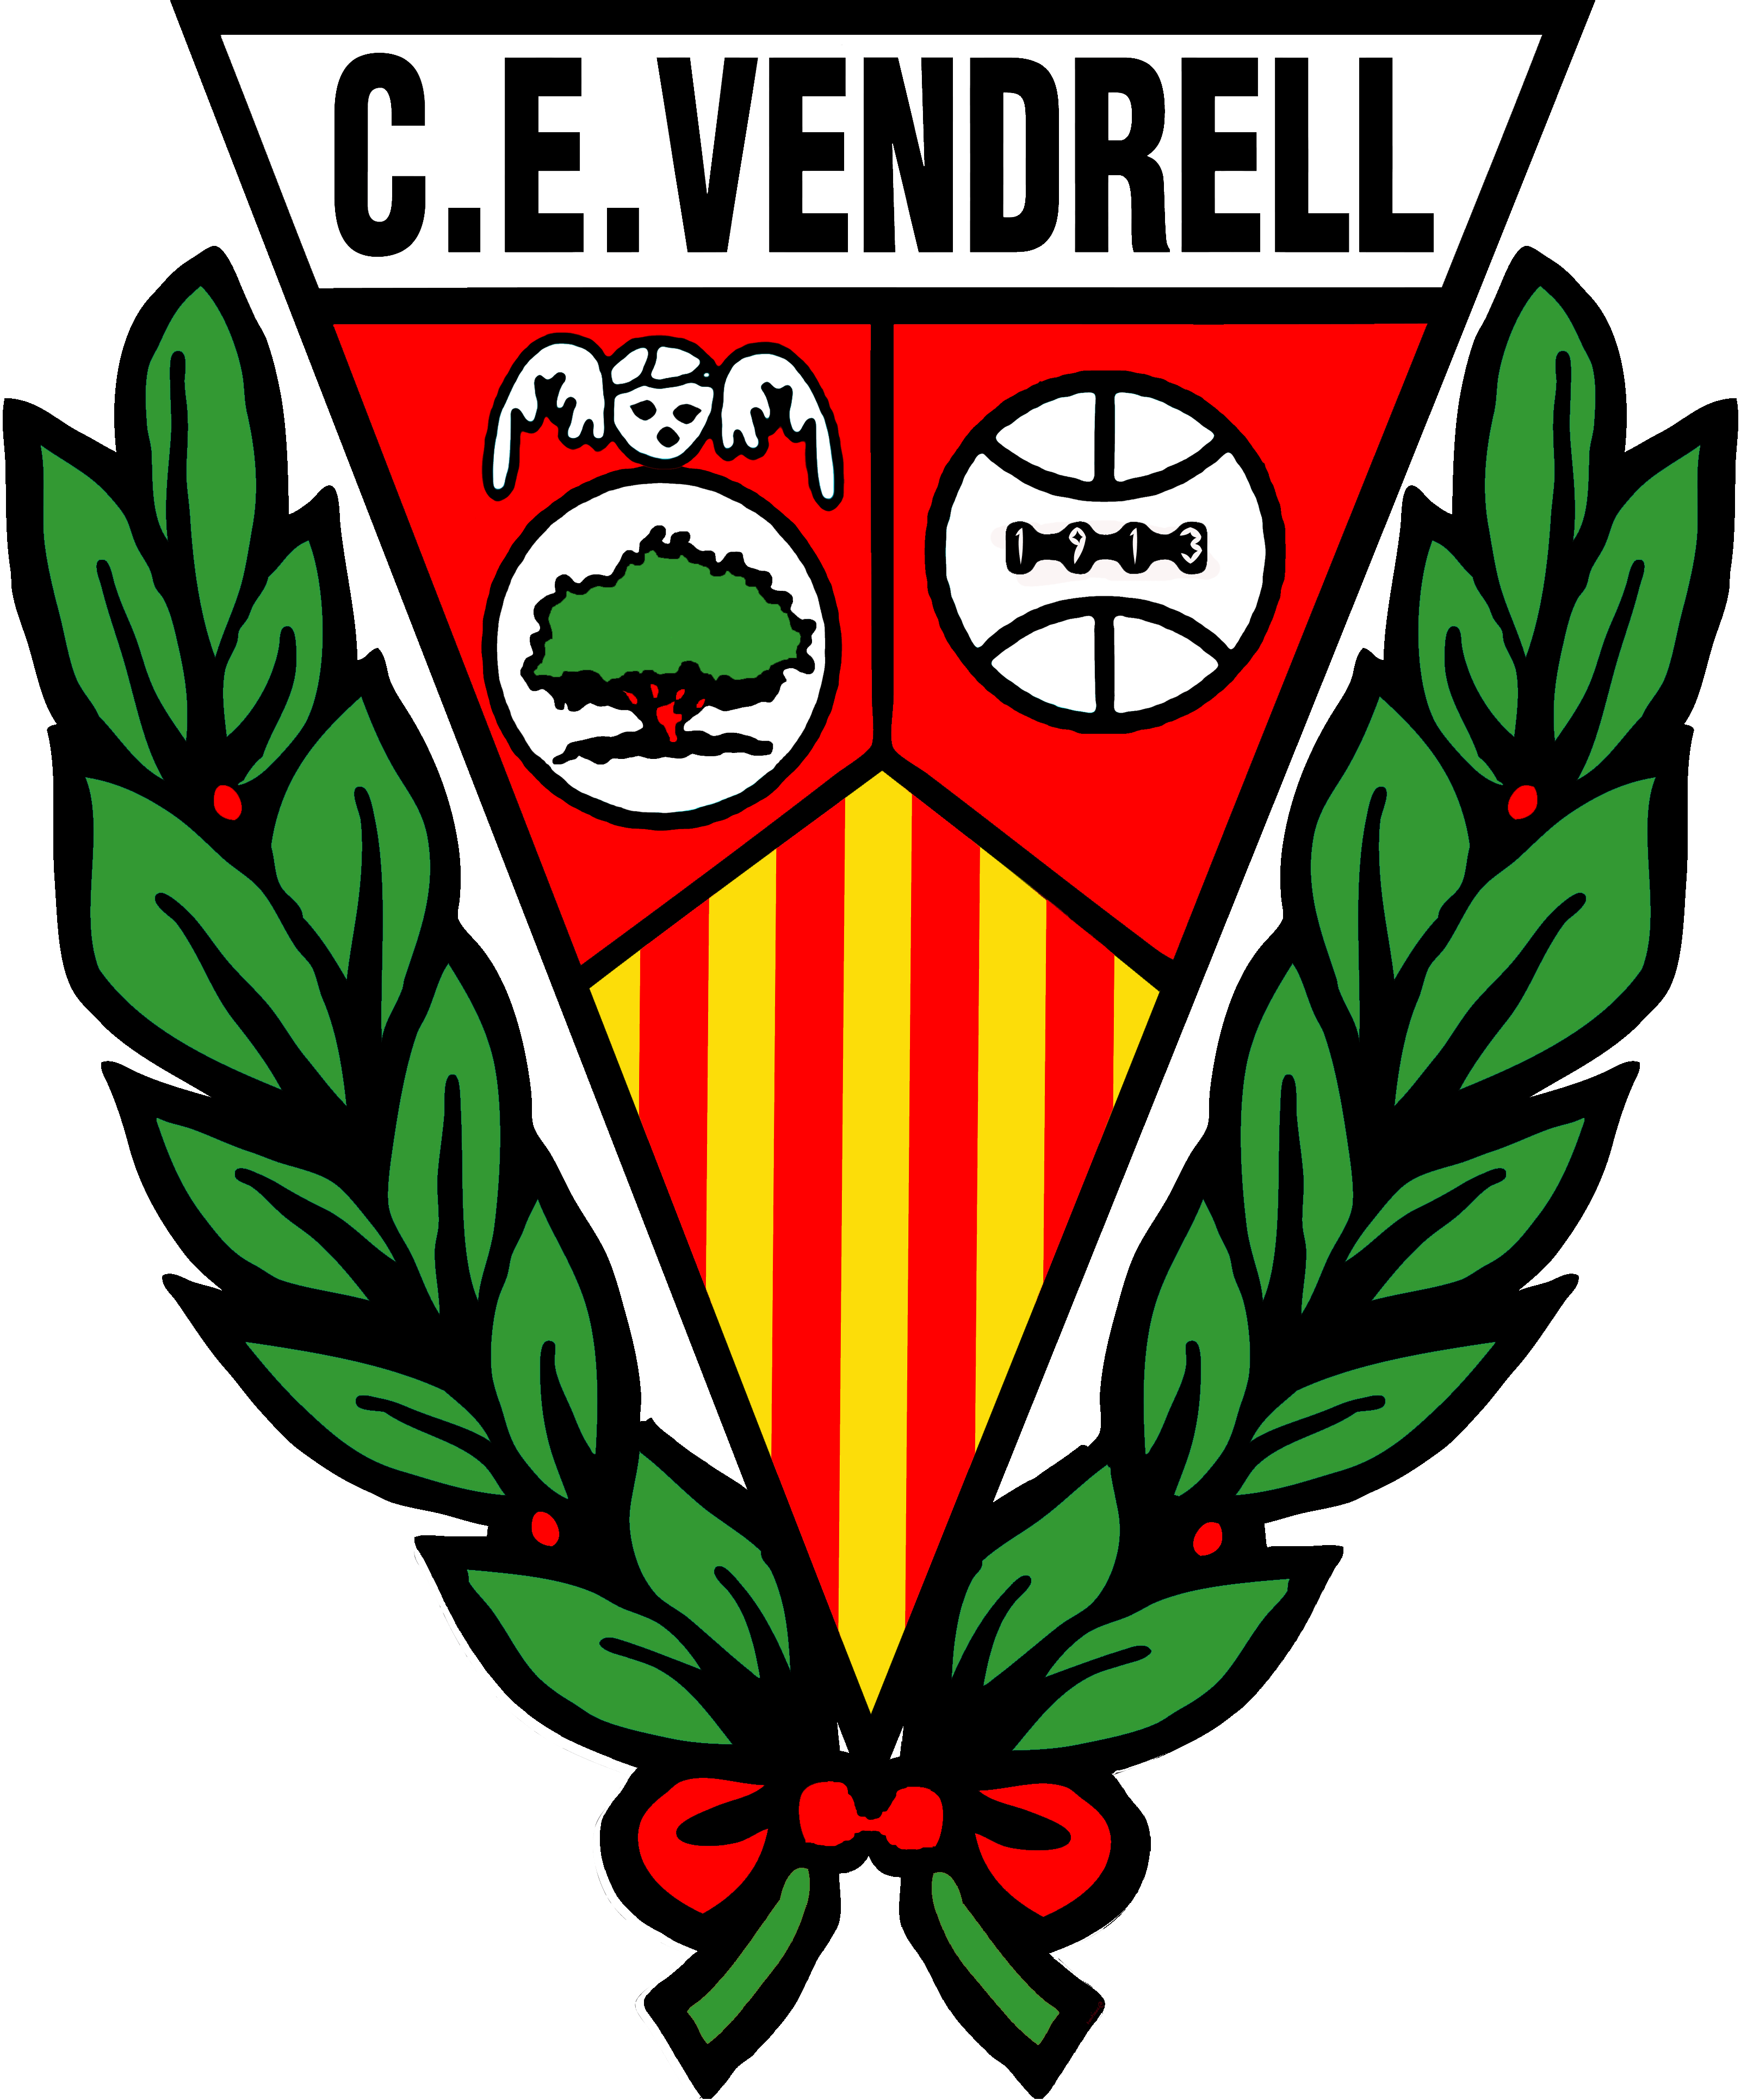 C.E. Vendrell Alevi B